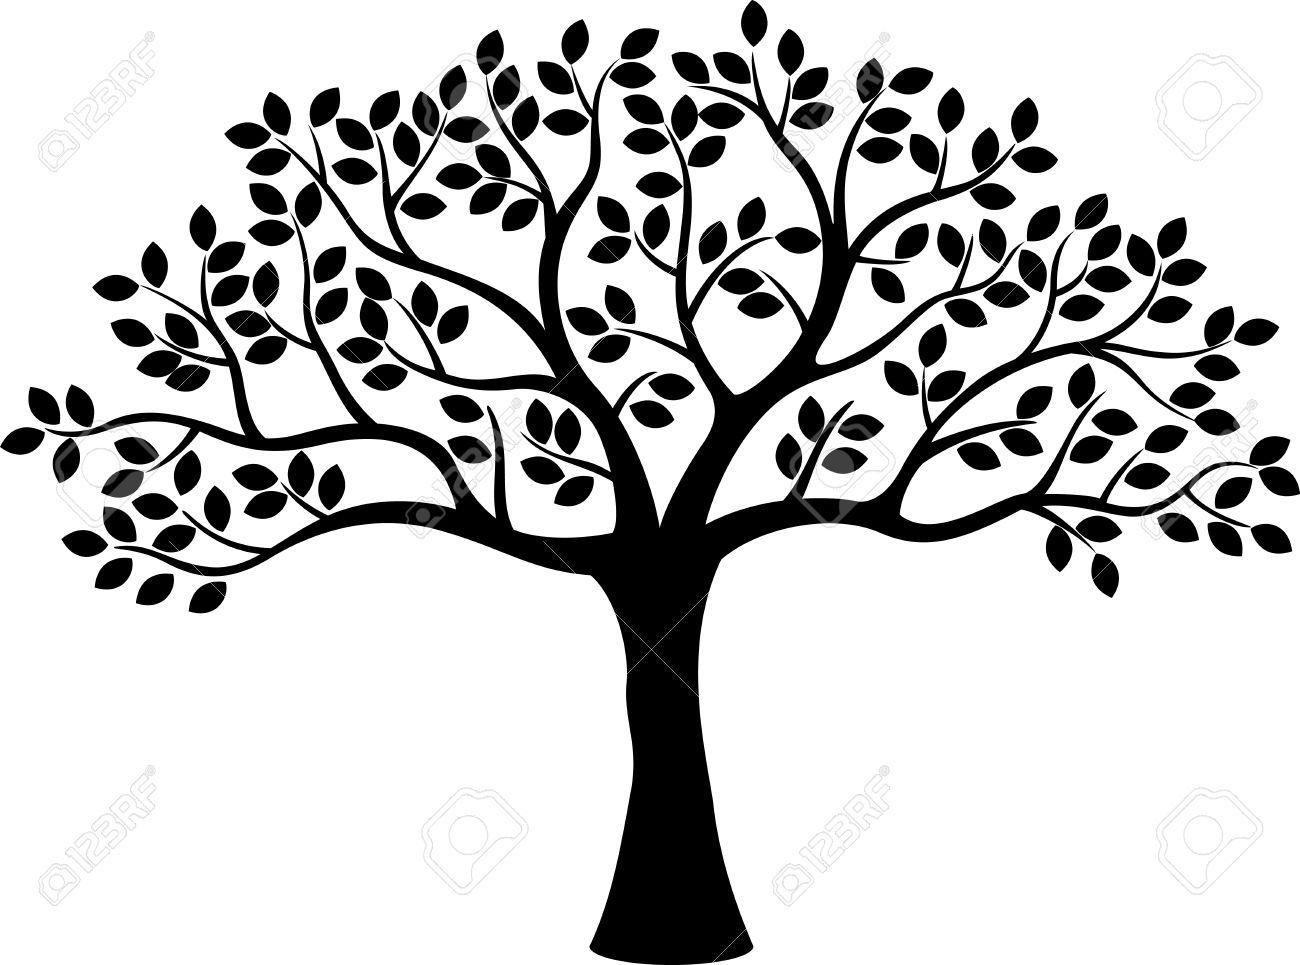 silhouette tree vector at getdrawings com free for personal use rh getdrawings com tree vector png tree vector silhouette